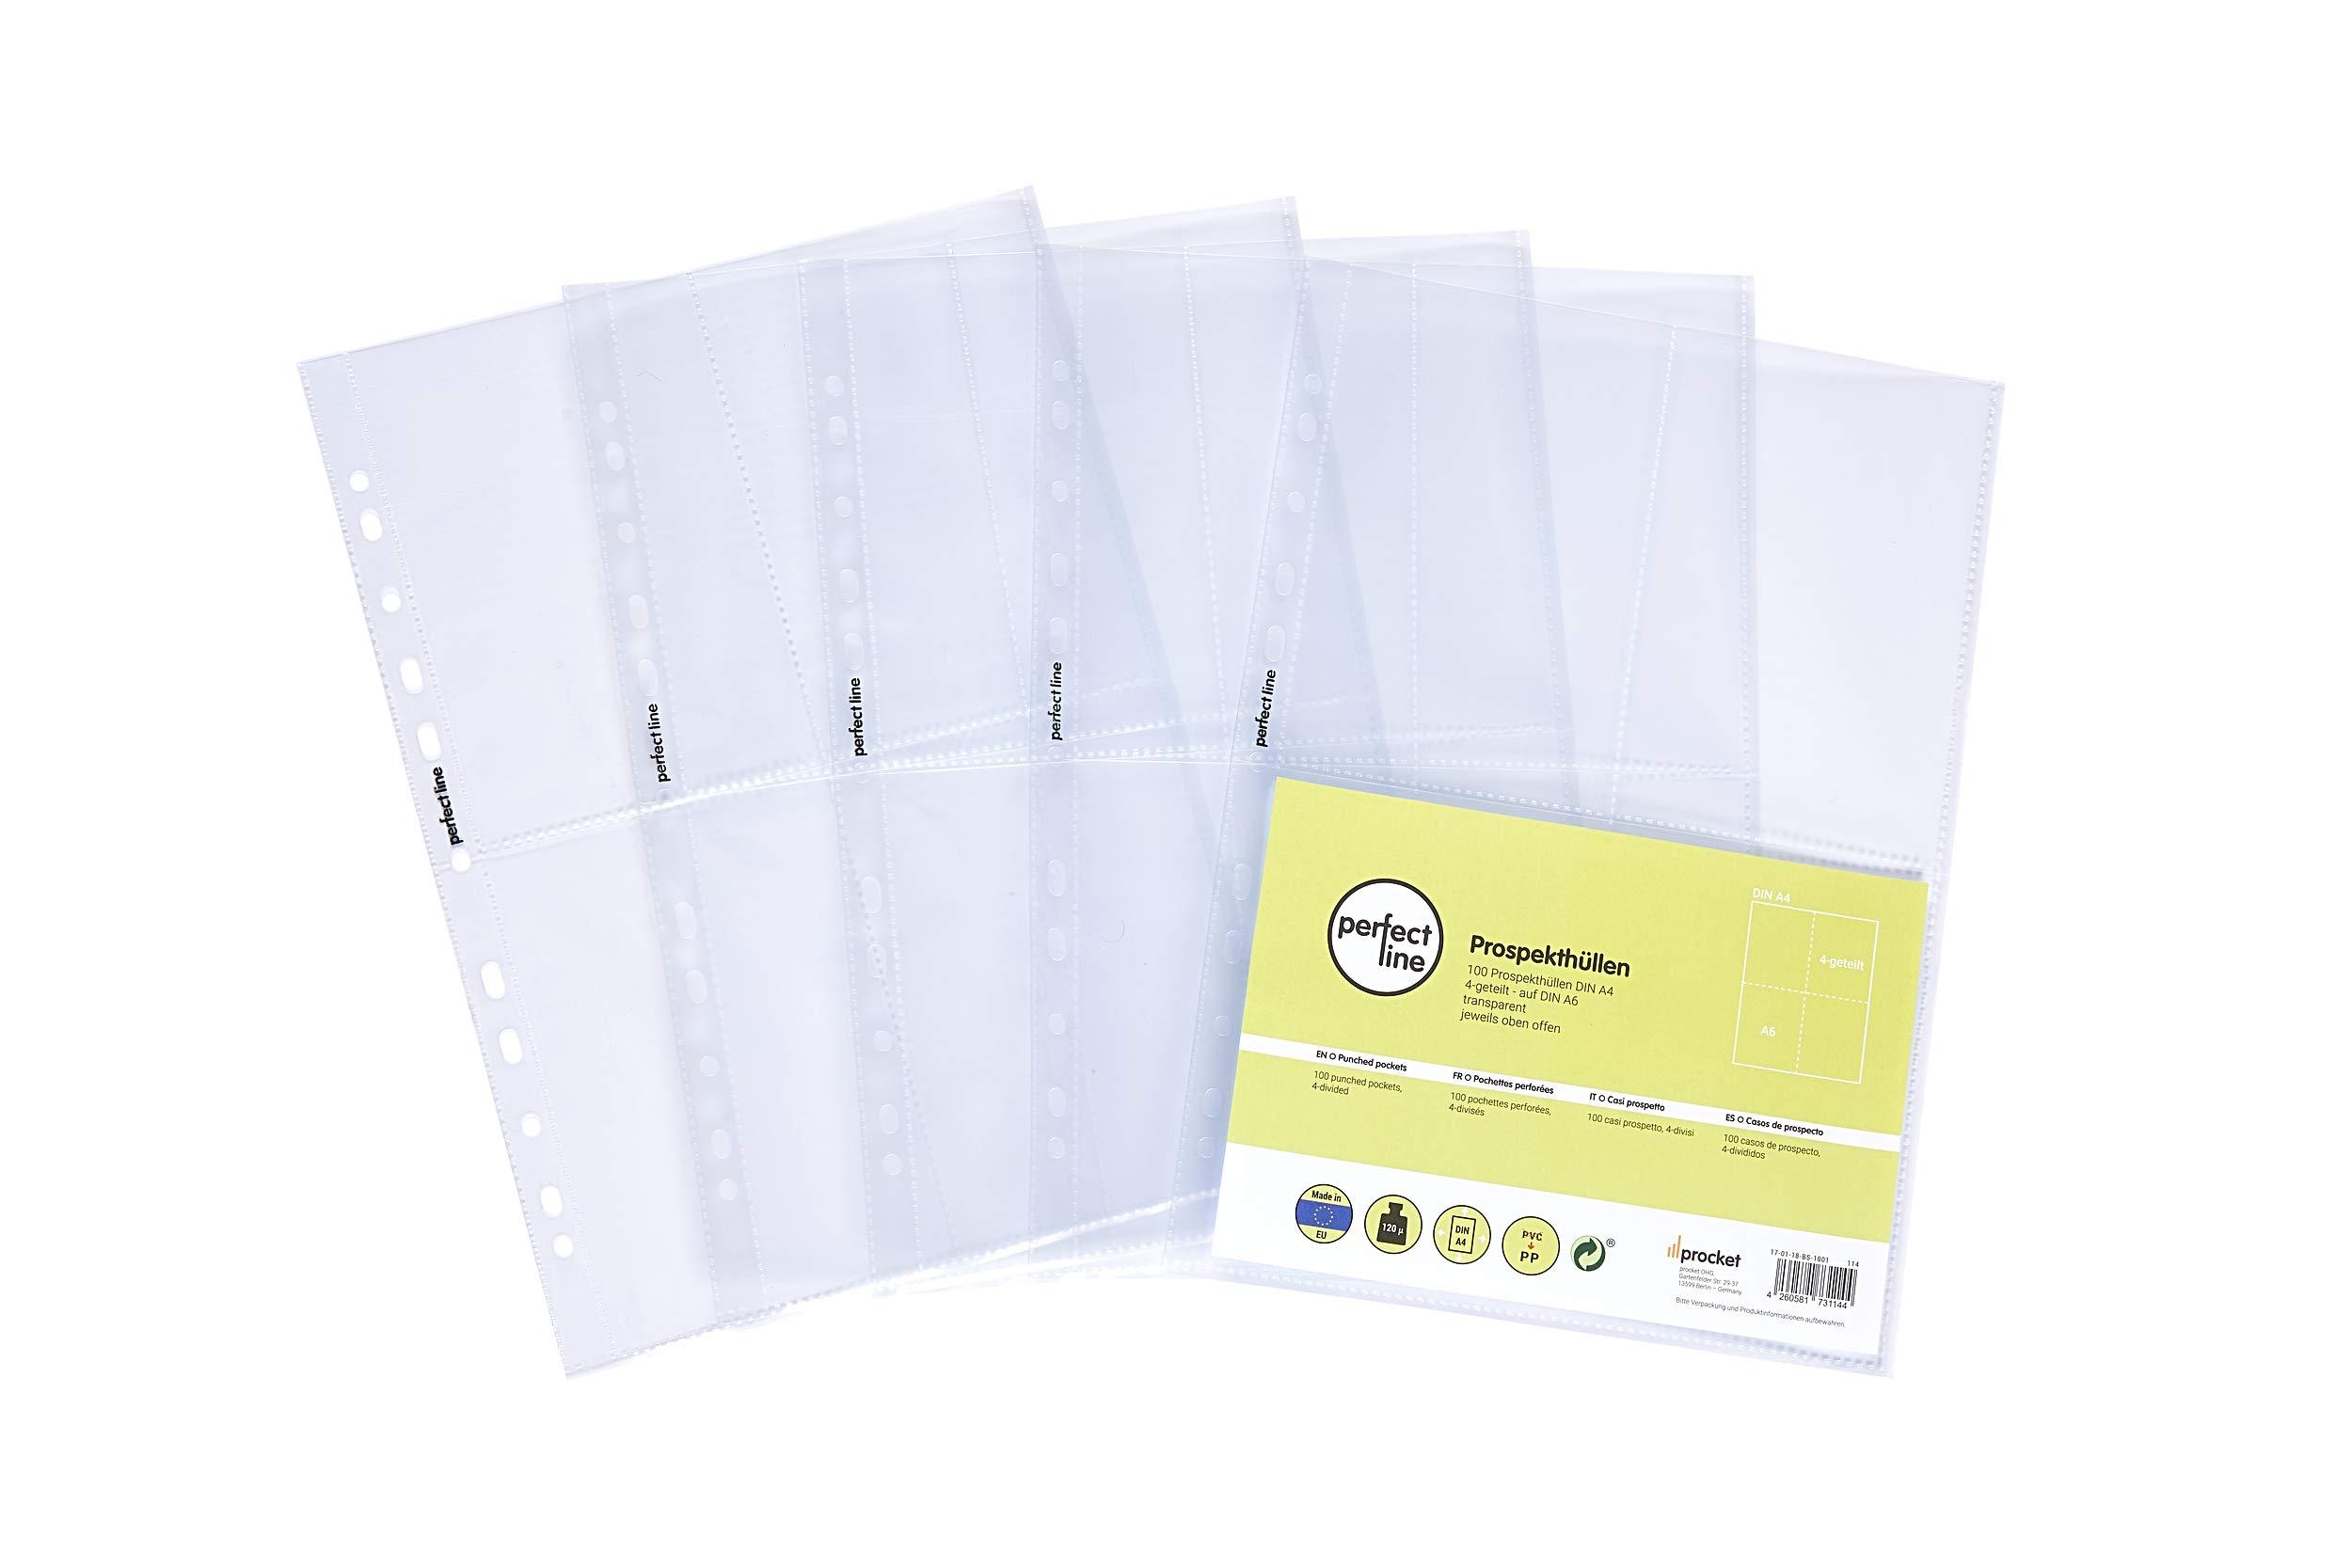 perfect line 100 fundas para guardar transparentes A4, divididas en 4 partes A6, lámina